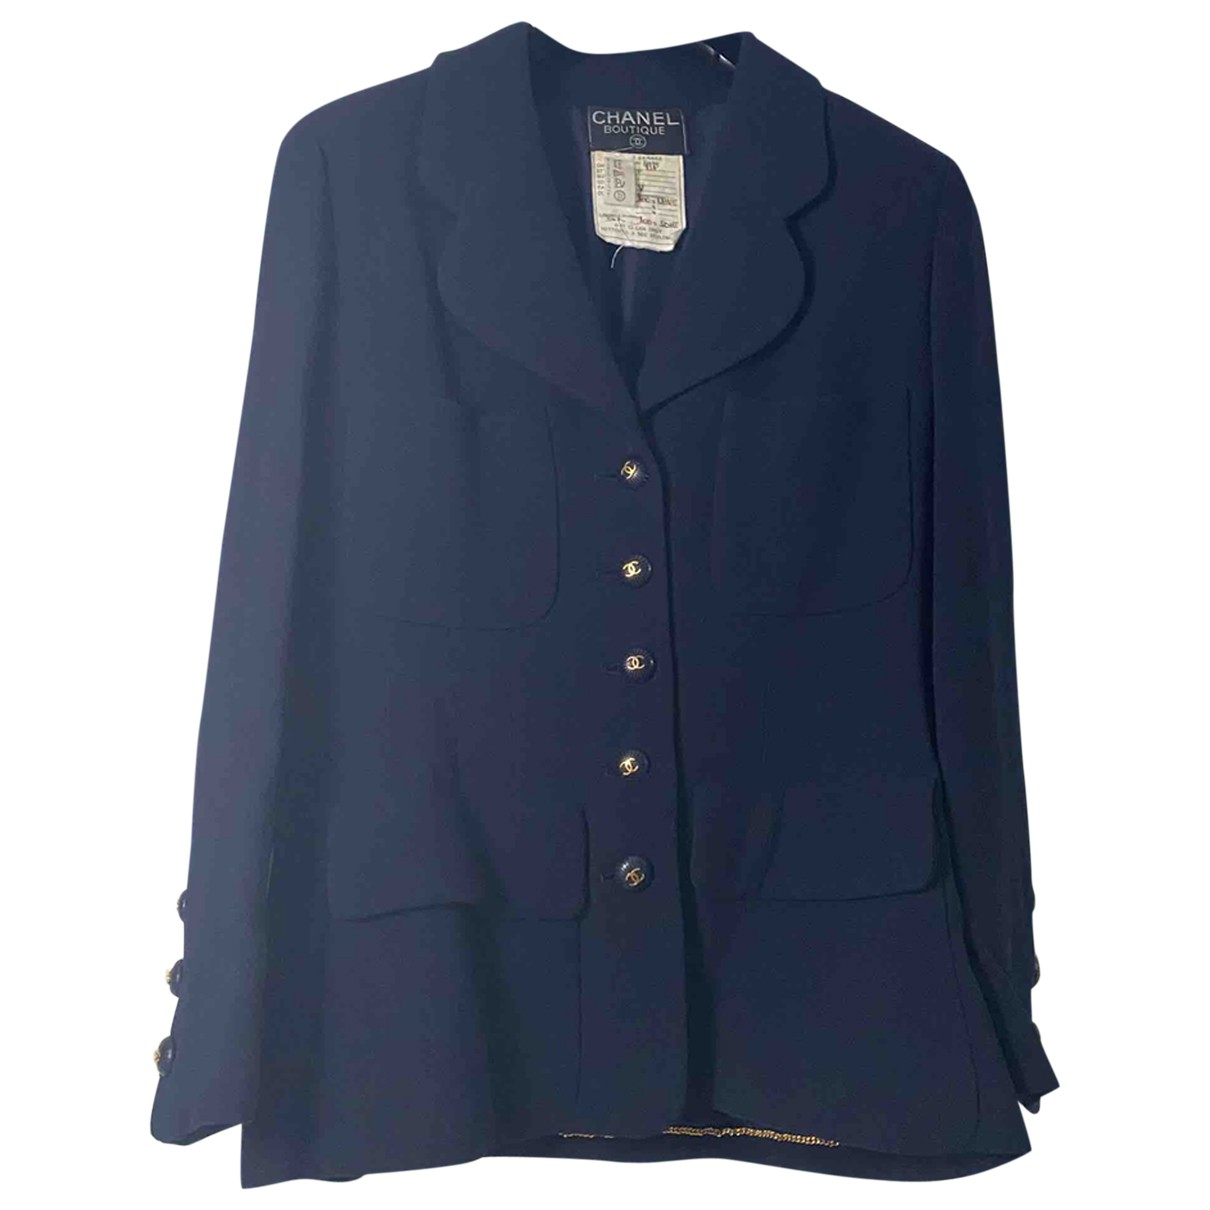 Chanel \N Navy jacket for Women 38 FR